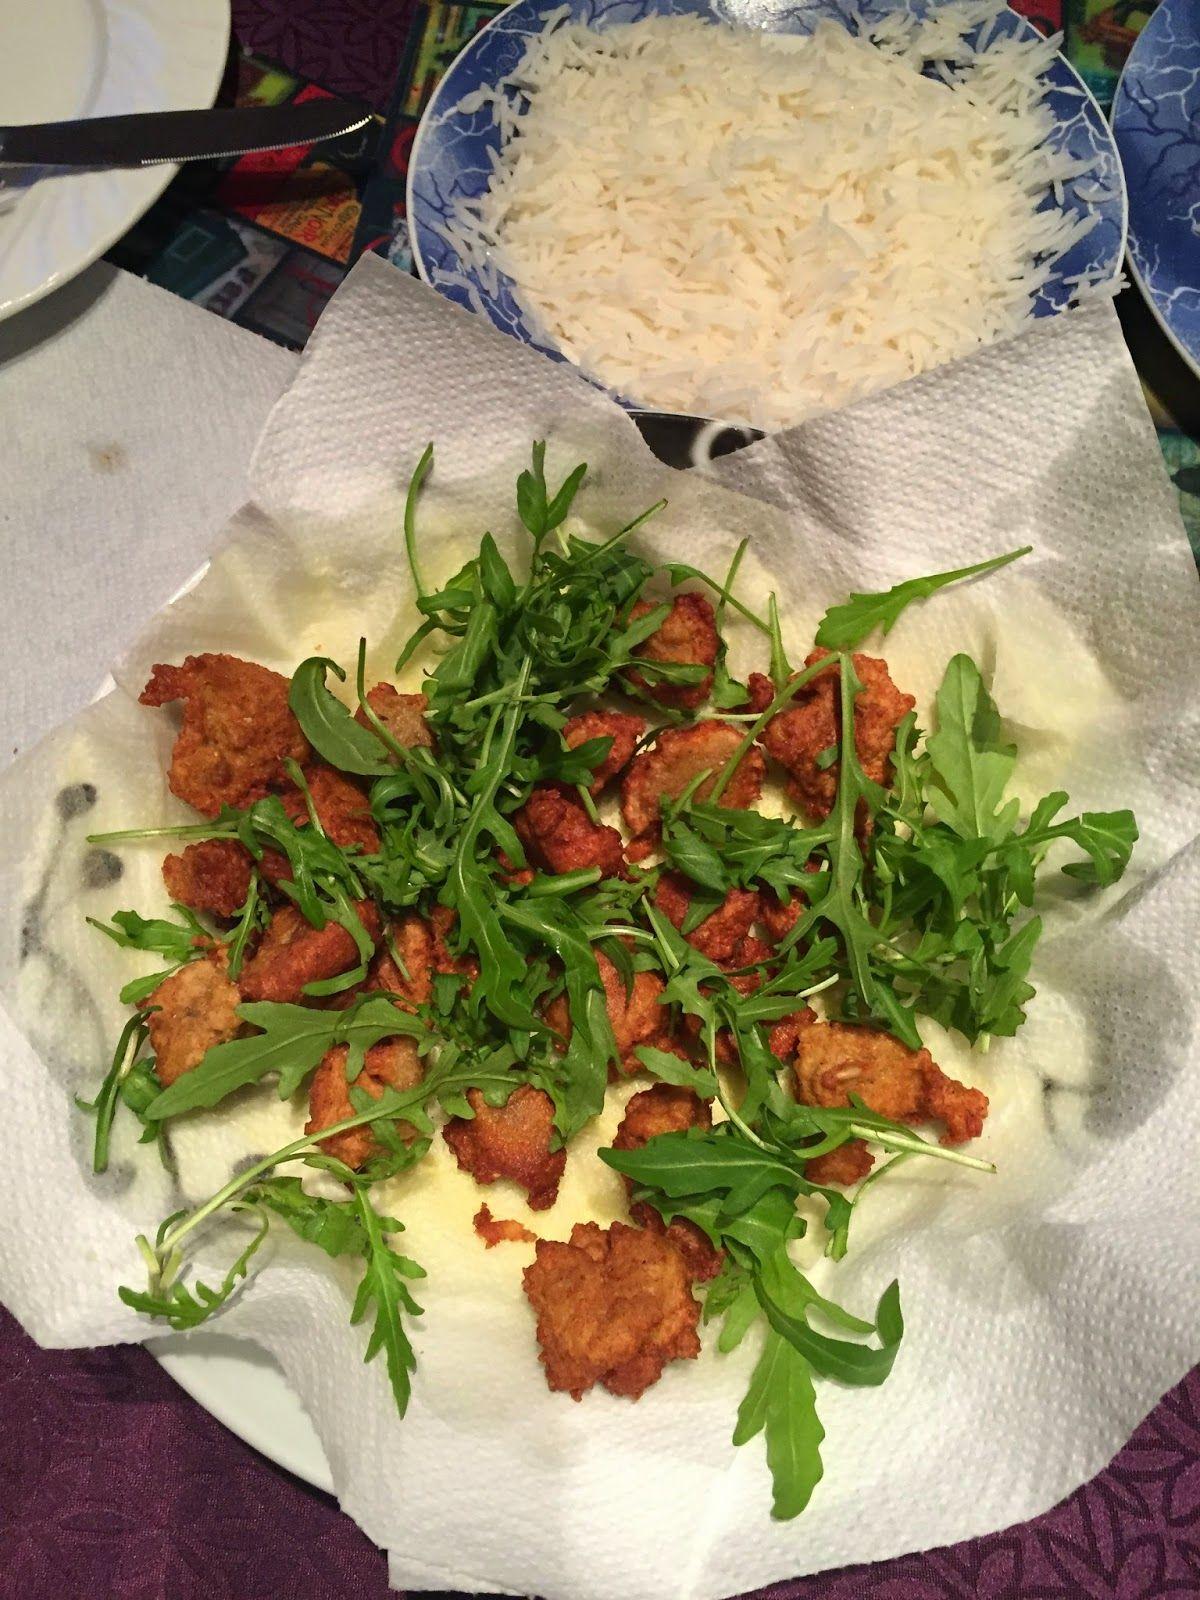 ANITAS MATBLOGG: Friterte grønnsaksboller i tomatsaus